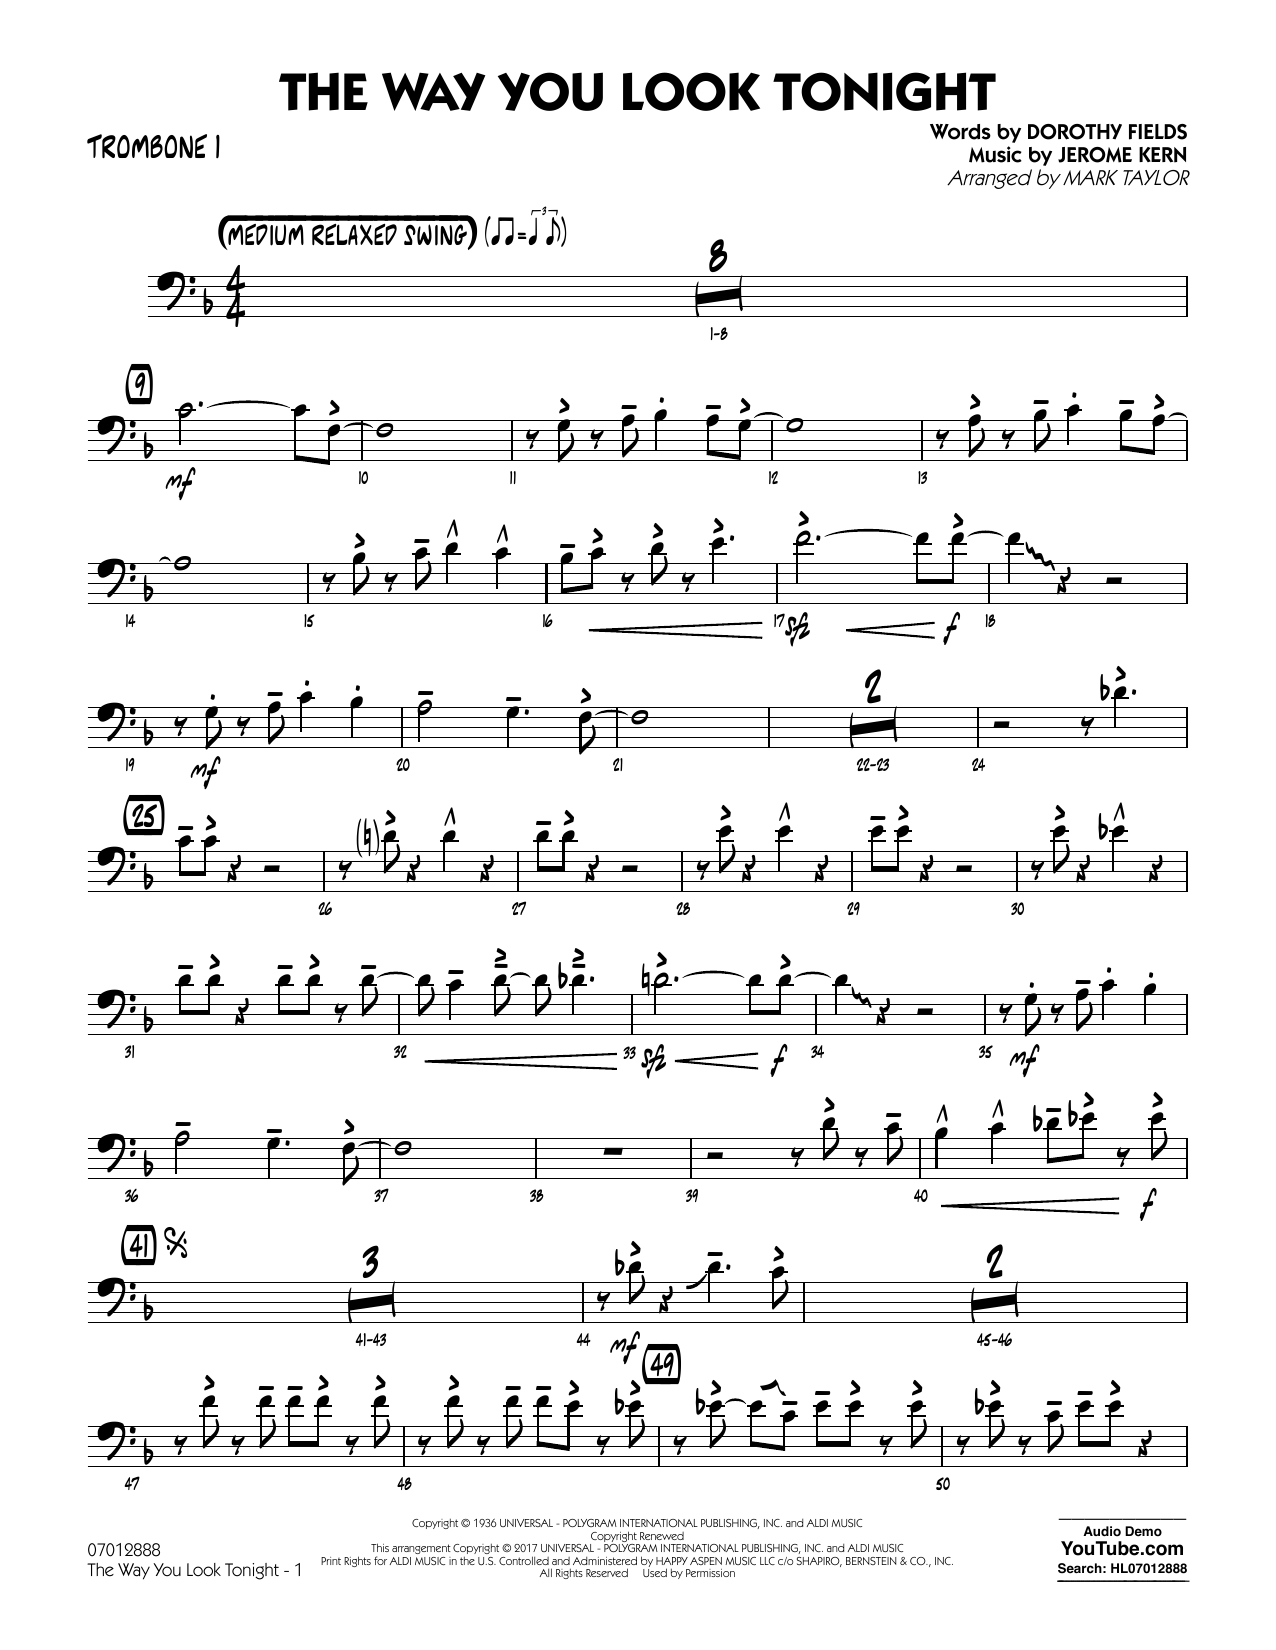 Jerome Kern - The Way You Look Tonight - Trombone 1